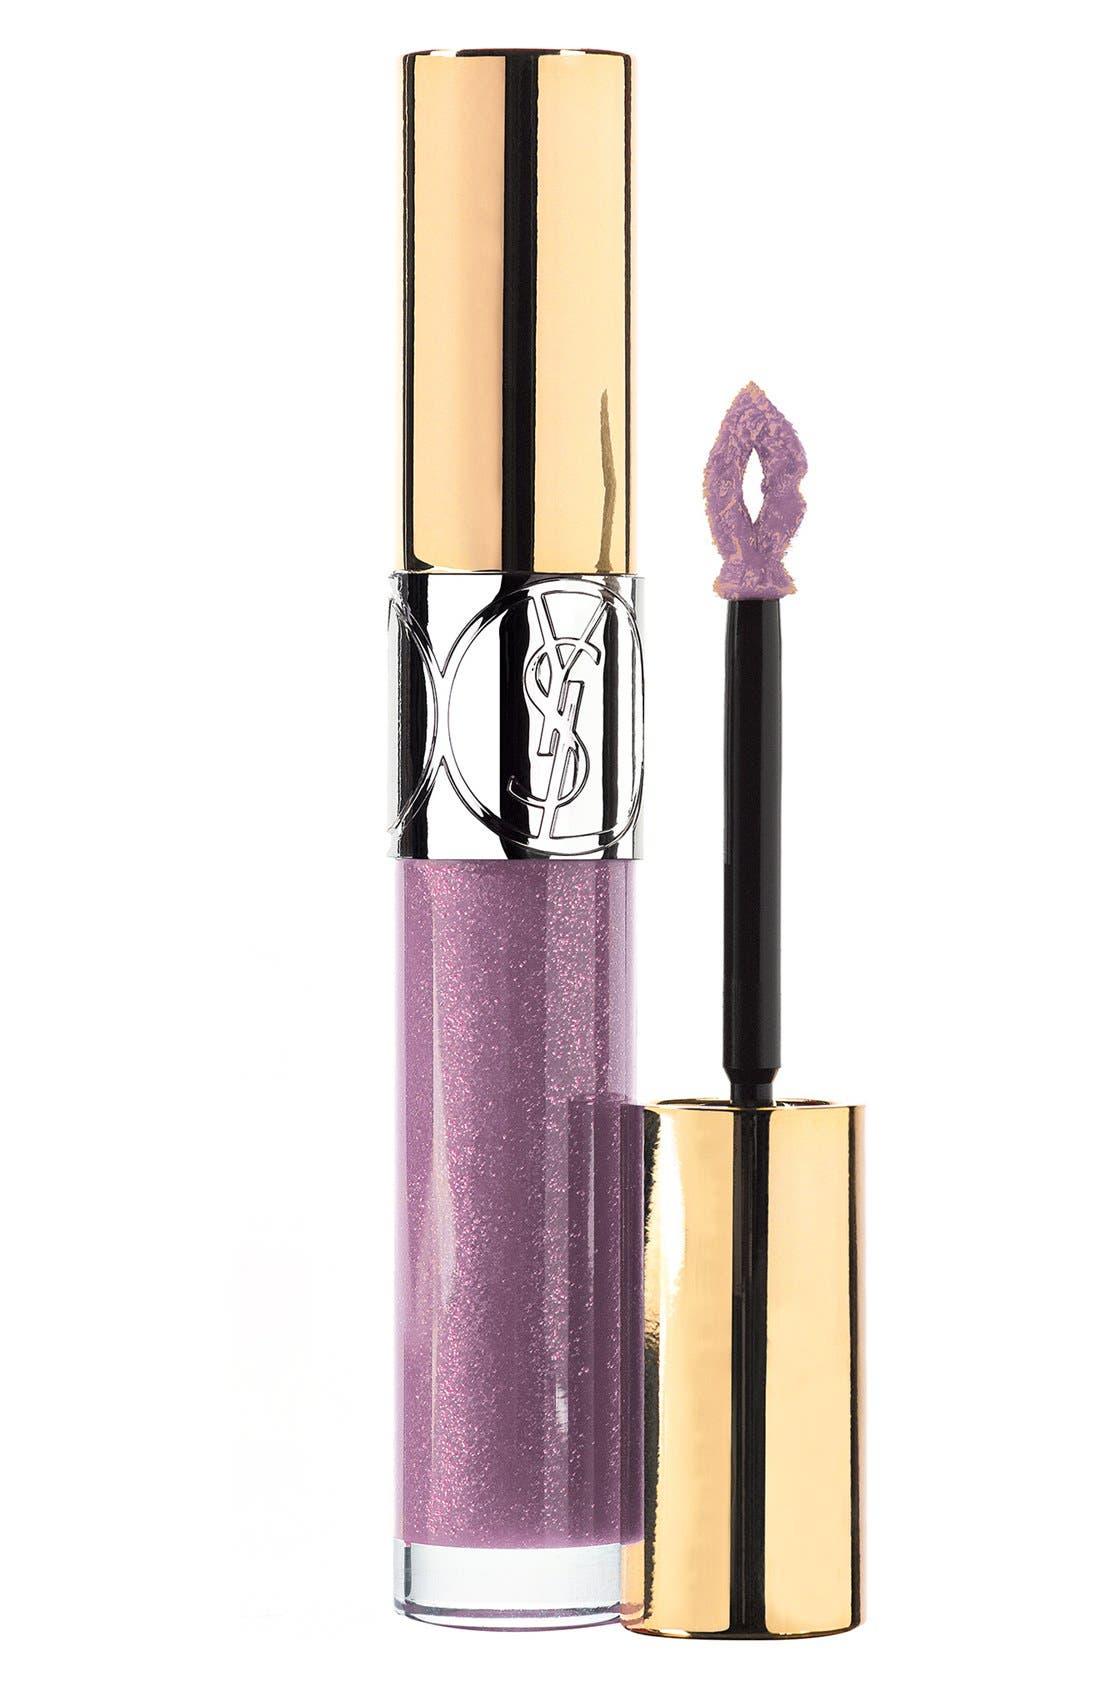 'Gloss Volupte' Lip Gloss,                             Main thumbnail 8, color,